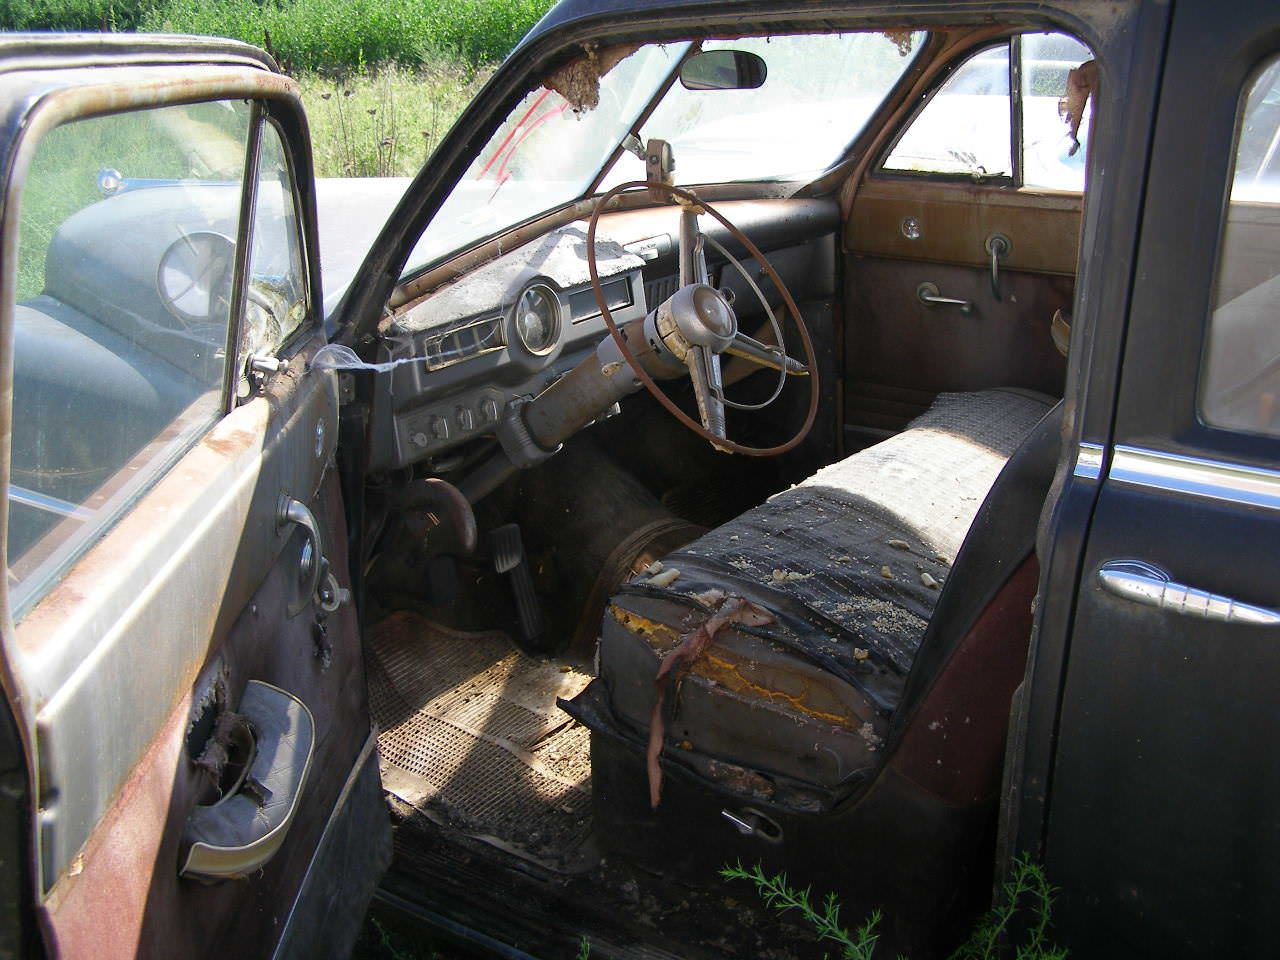 Dirty Car Interiors Making us Sick